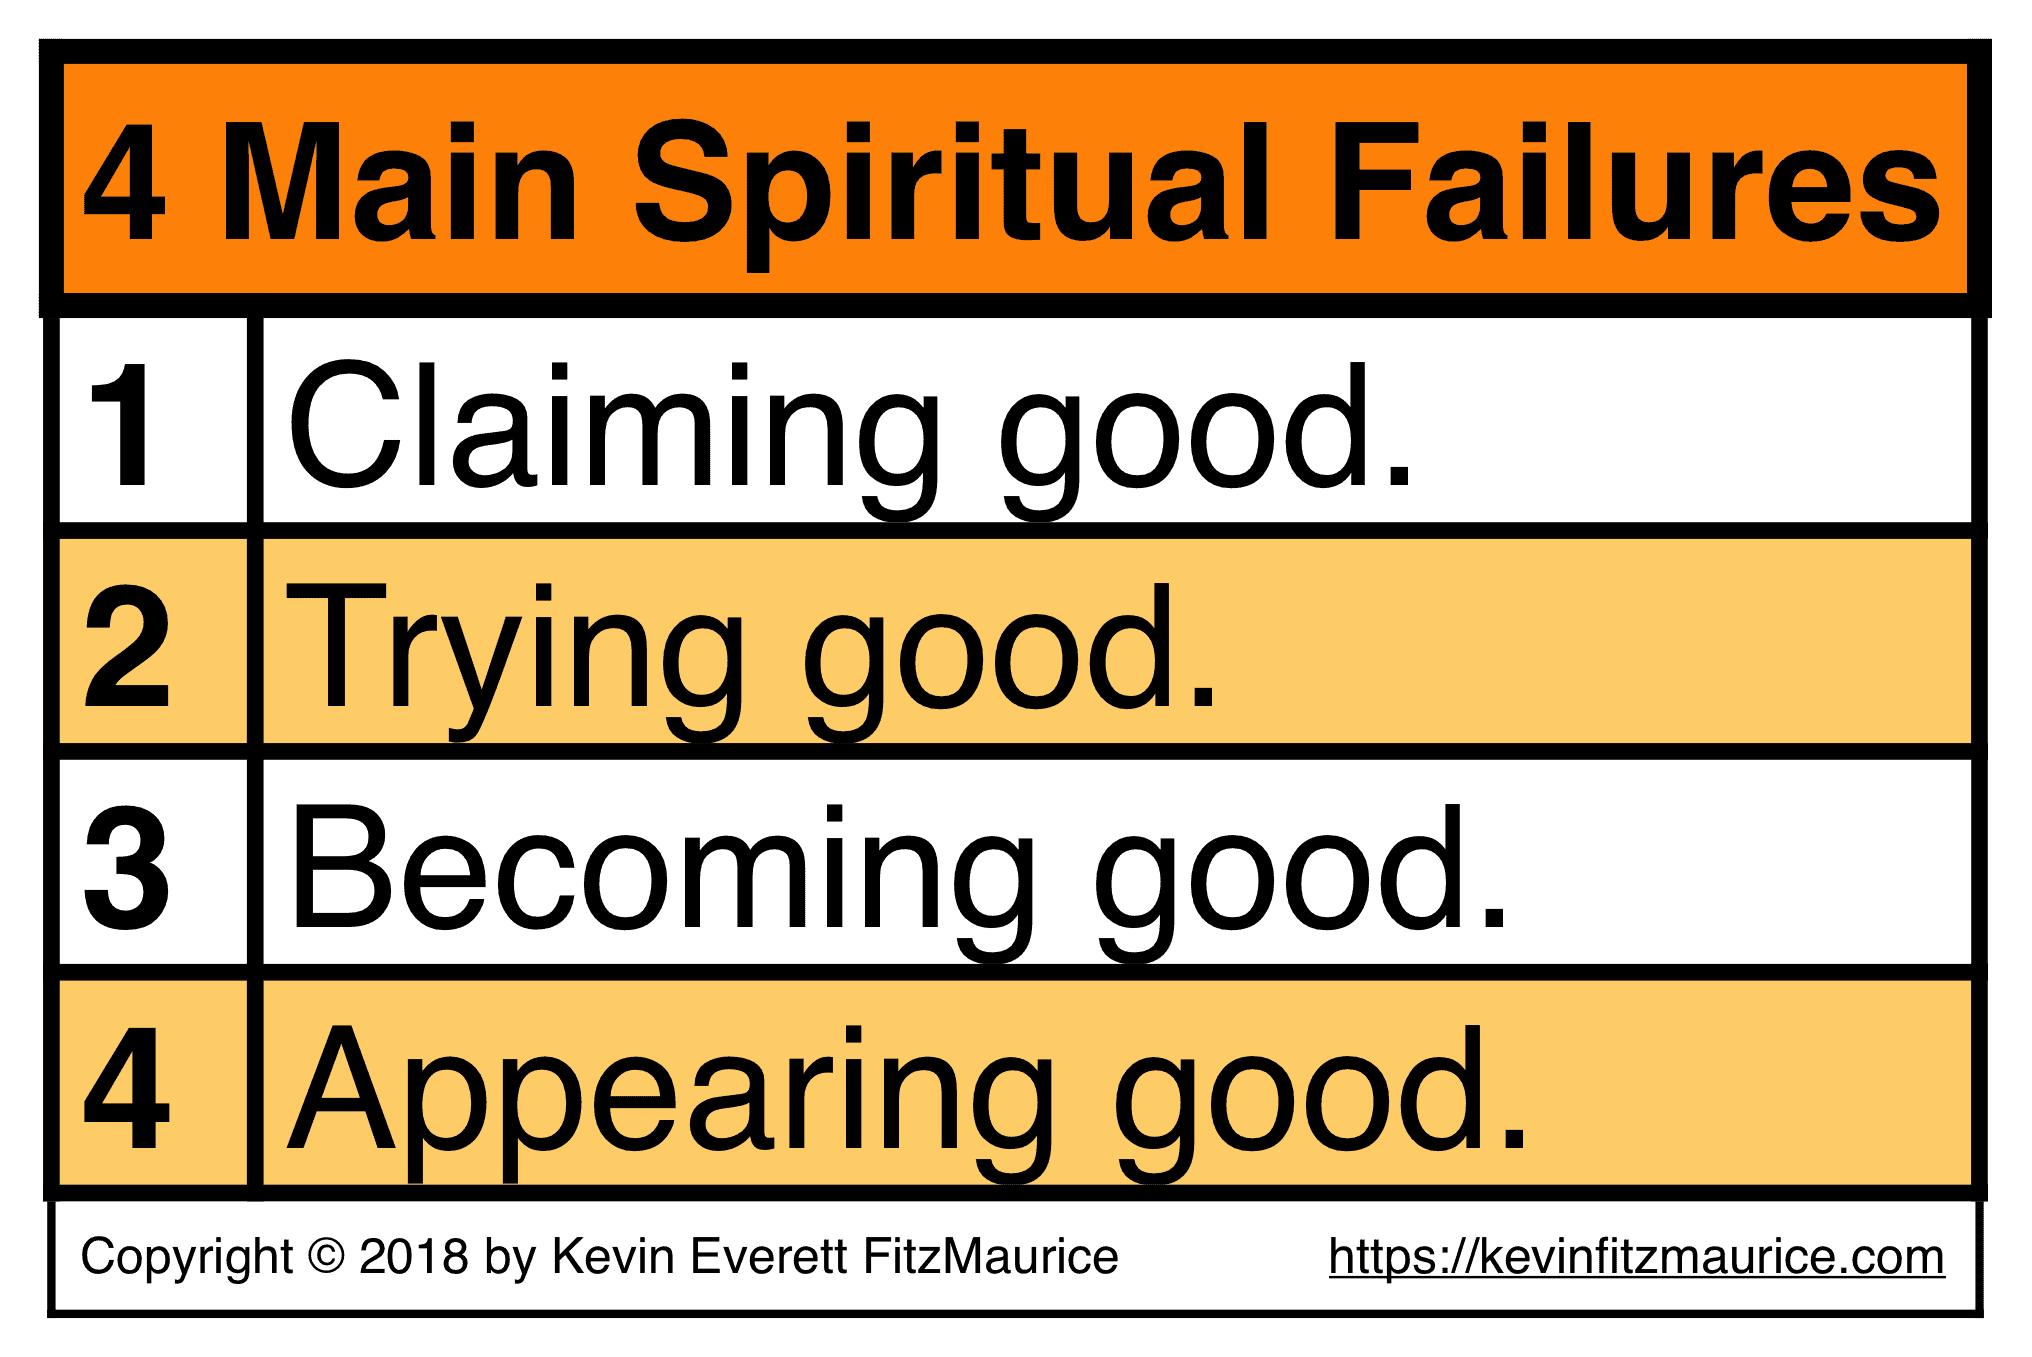 Simple Version of 4 Main Spiritual Failures